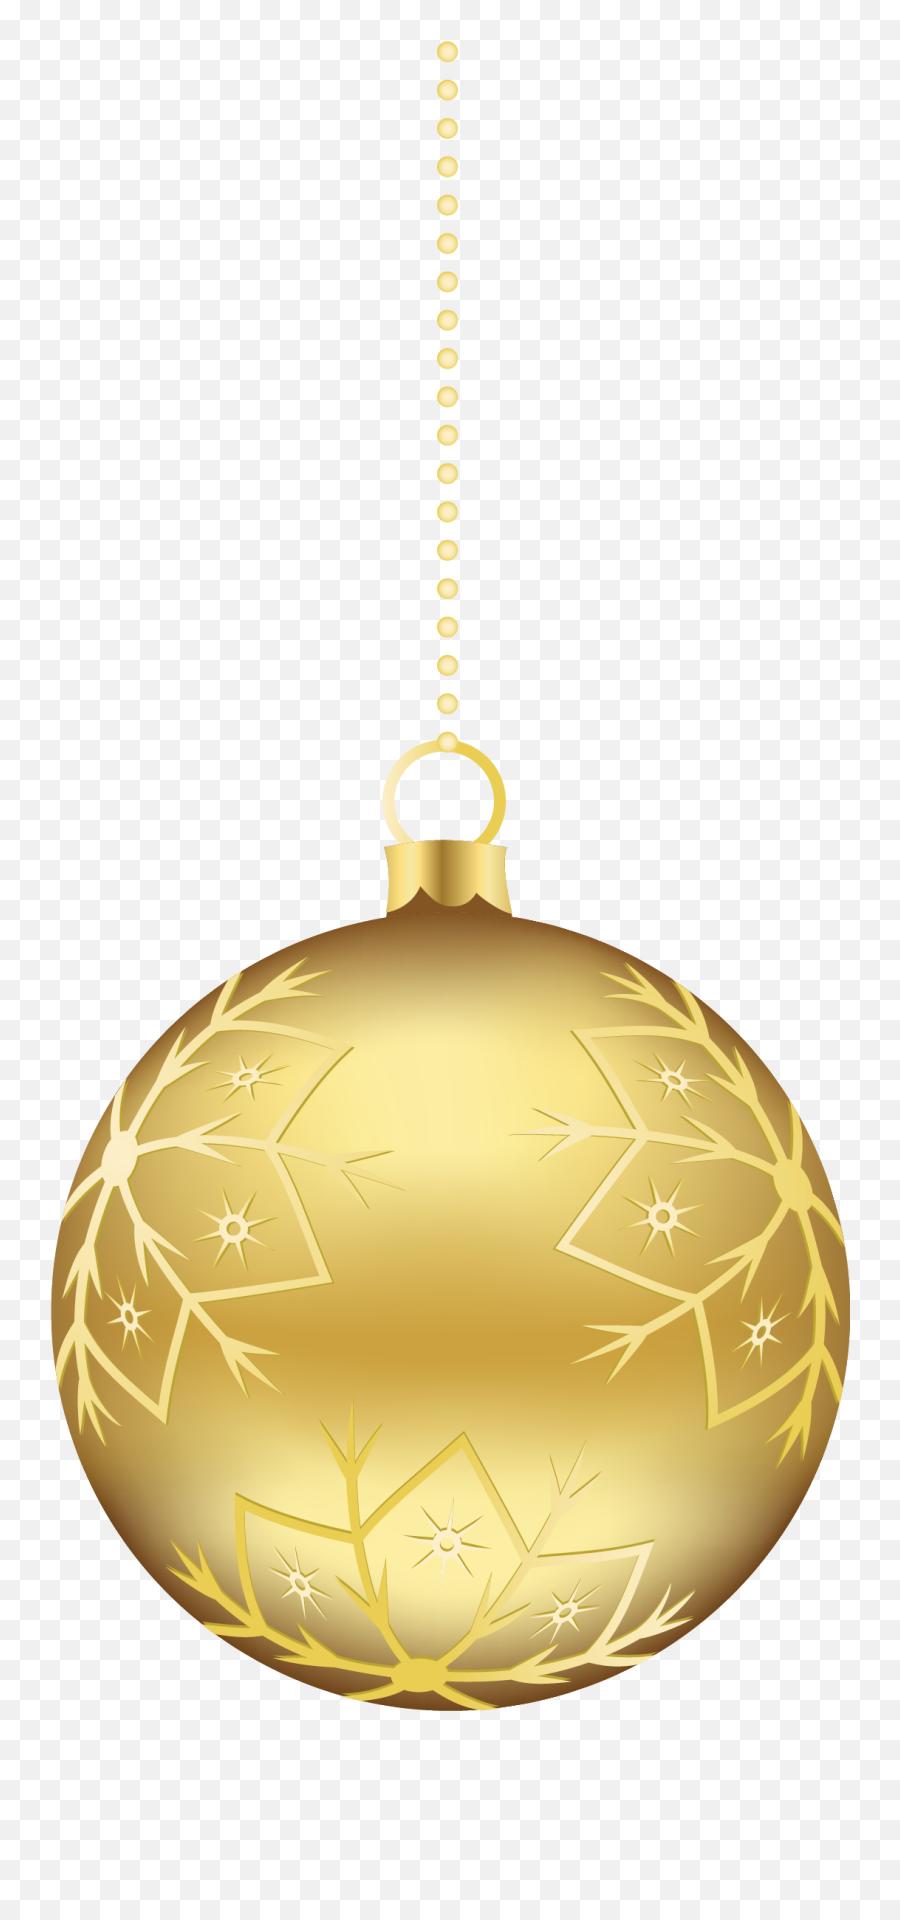 Download Free Png Gold Christmas Ornaments Png Clipart - Christmas Ball Transparent Png Emoji,Emoji Christmas Ornaments